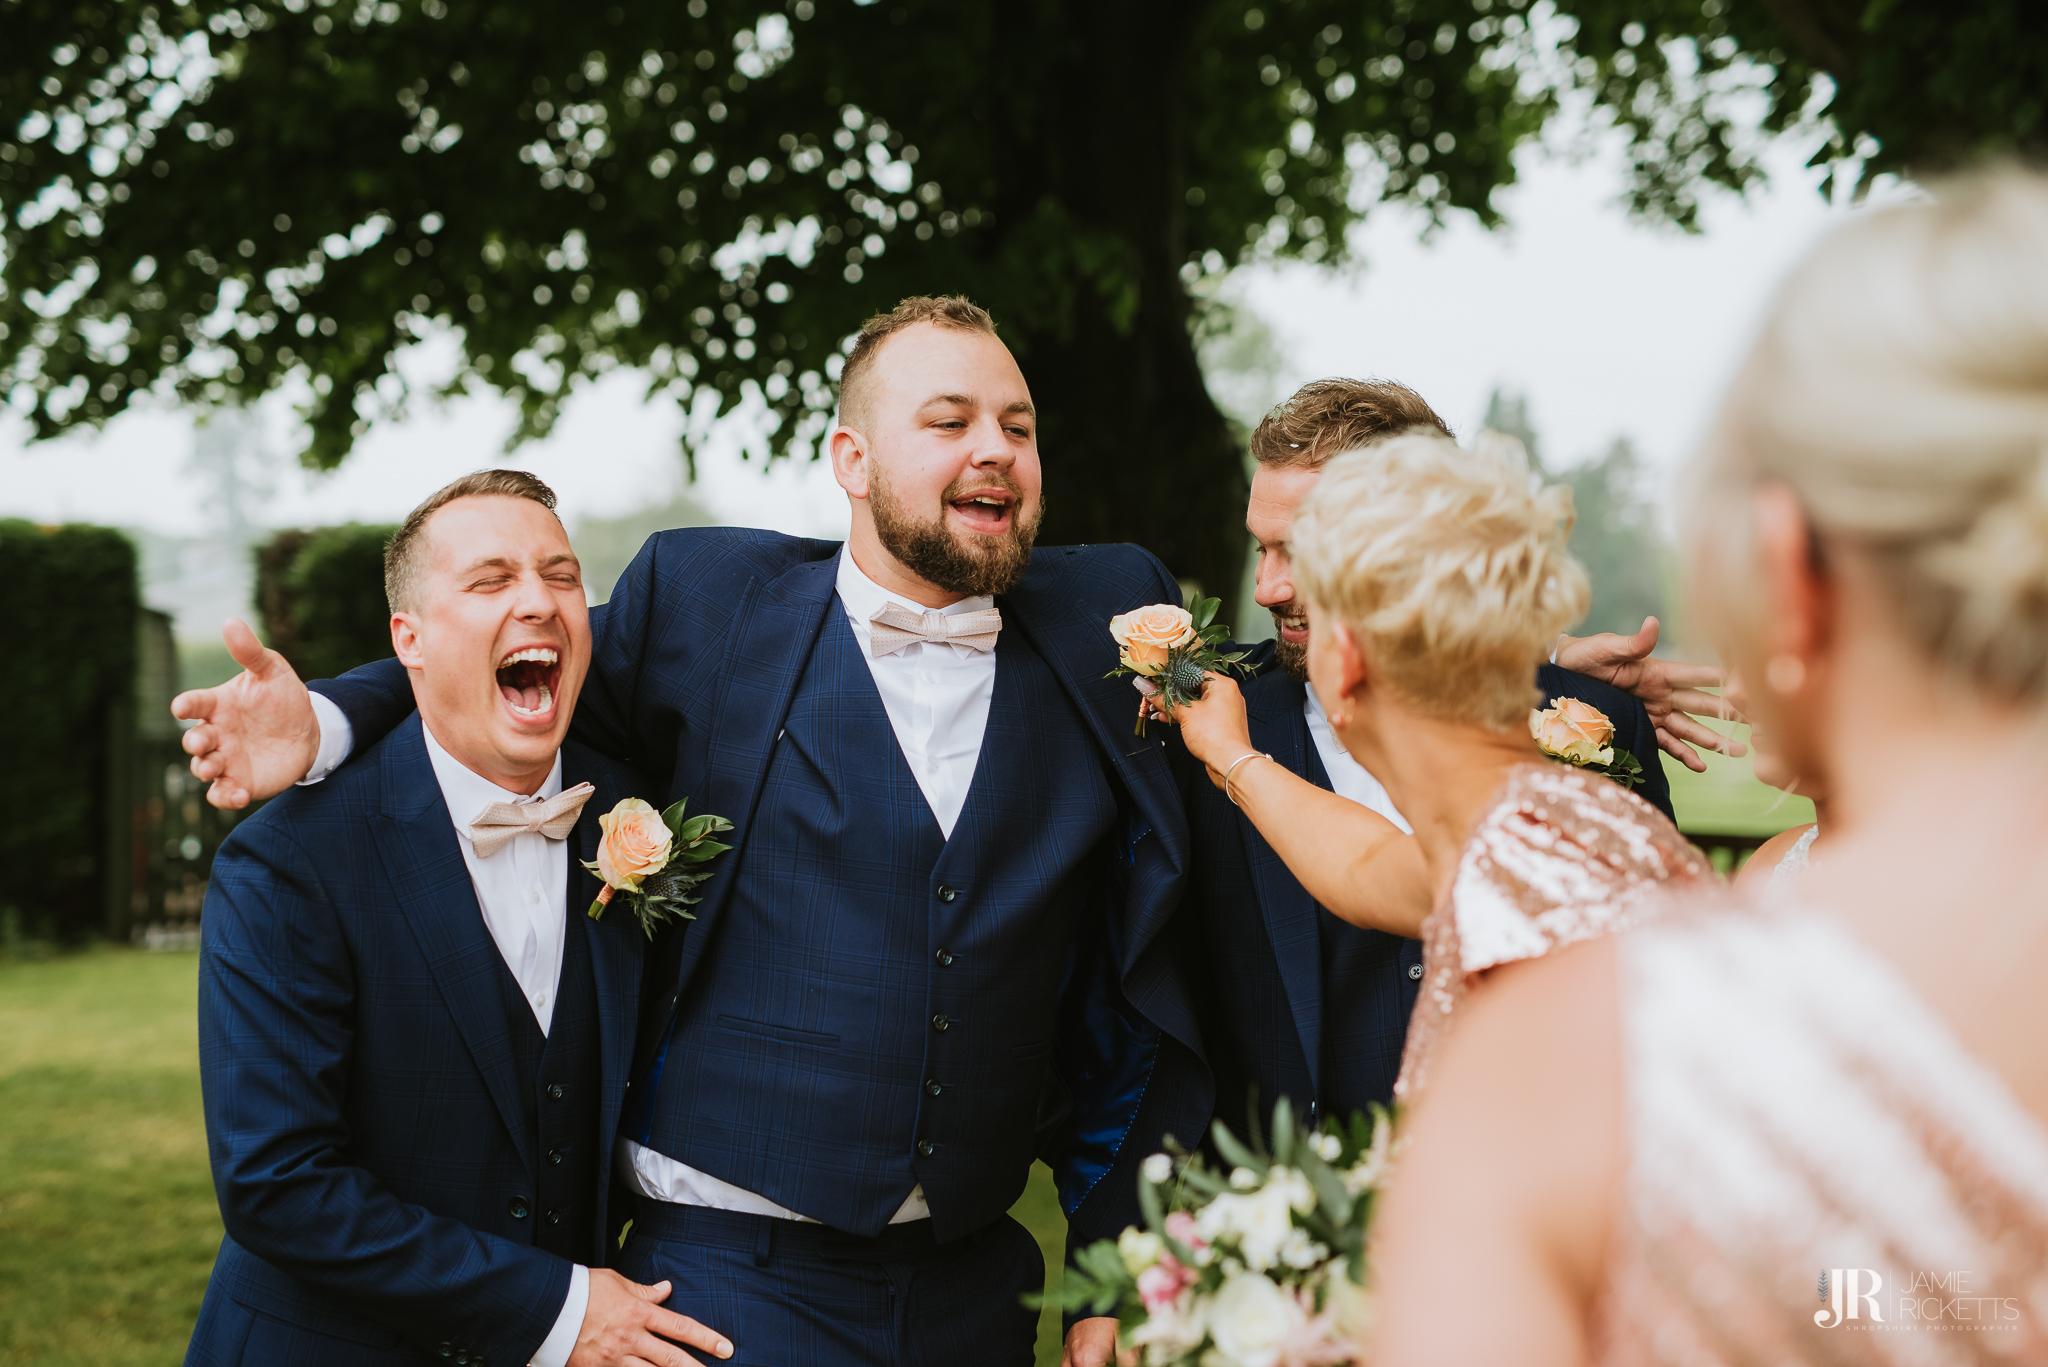 Wedding-Photographer-Shropshire-25.JPG